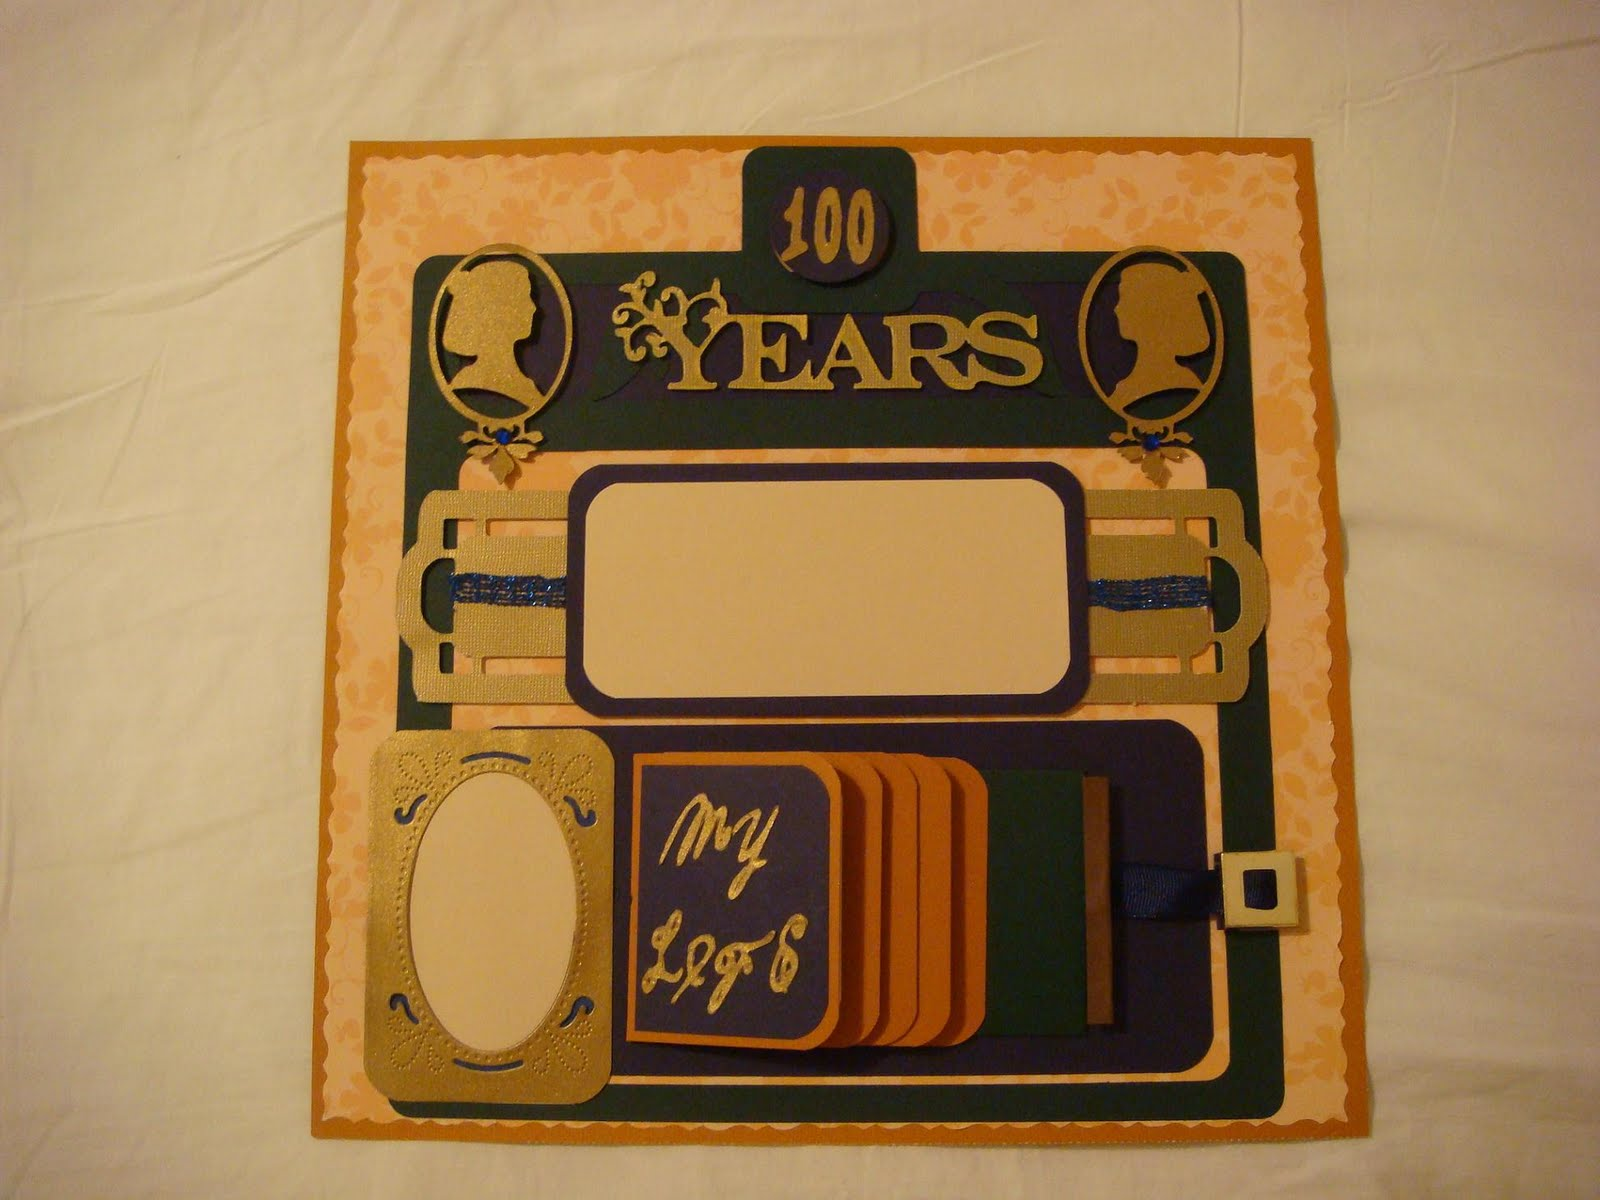 Scrapbook ideas pop up - Three Birthday Layouts Using The Cricut Expression